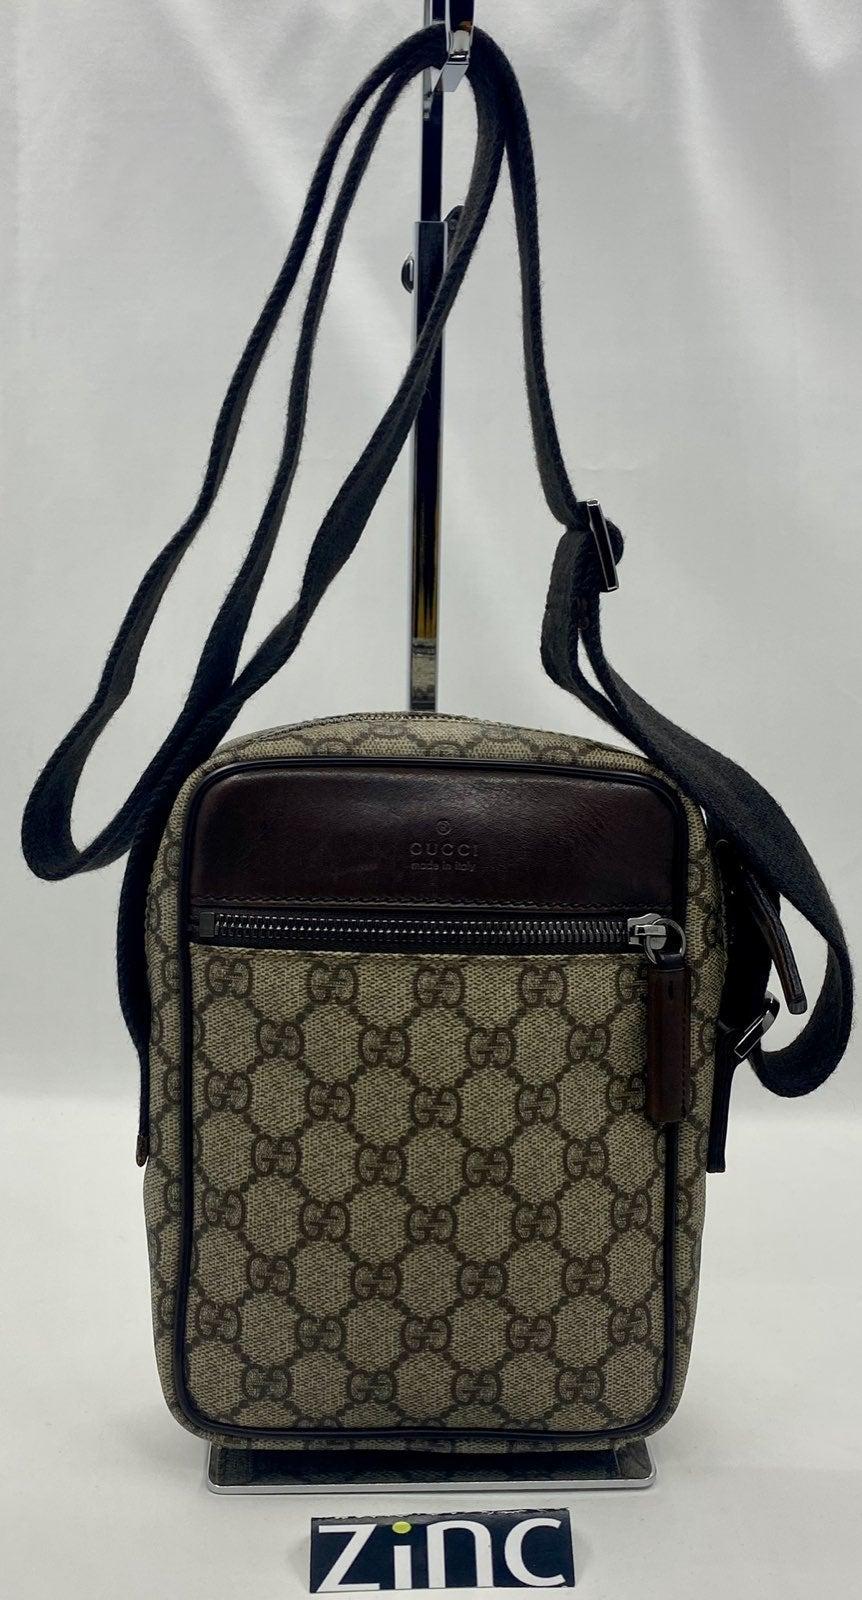 Gucci GG Supreme Cross Body/Shoulder Bag